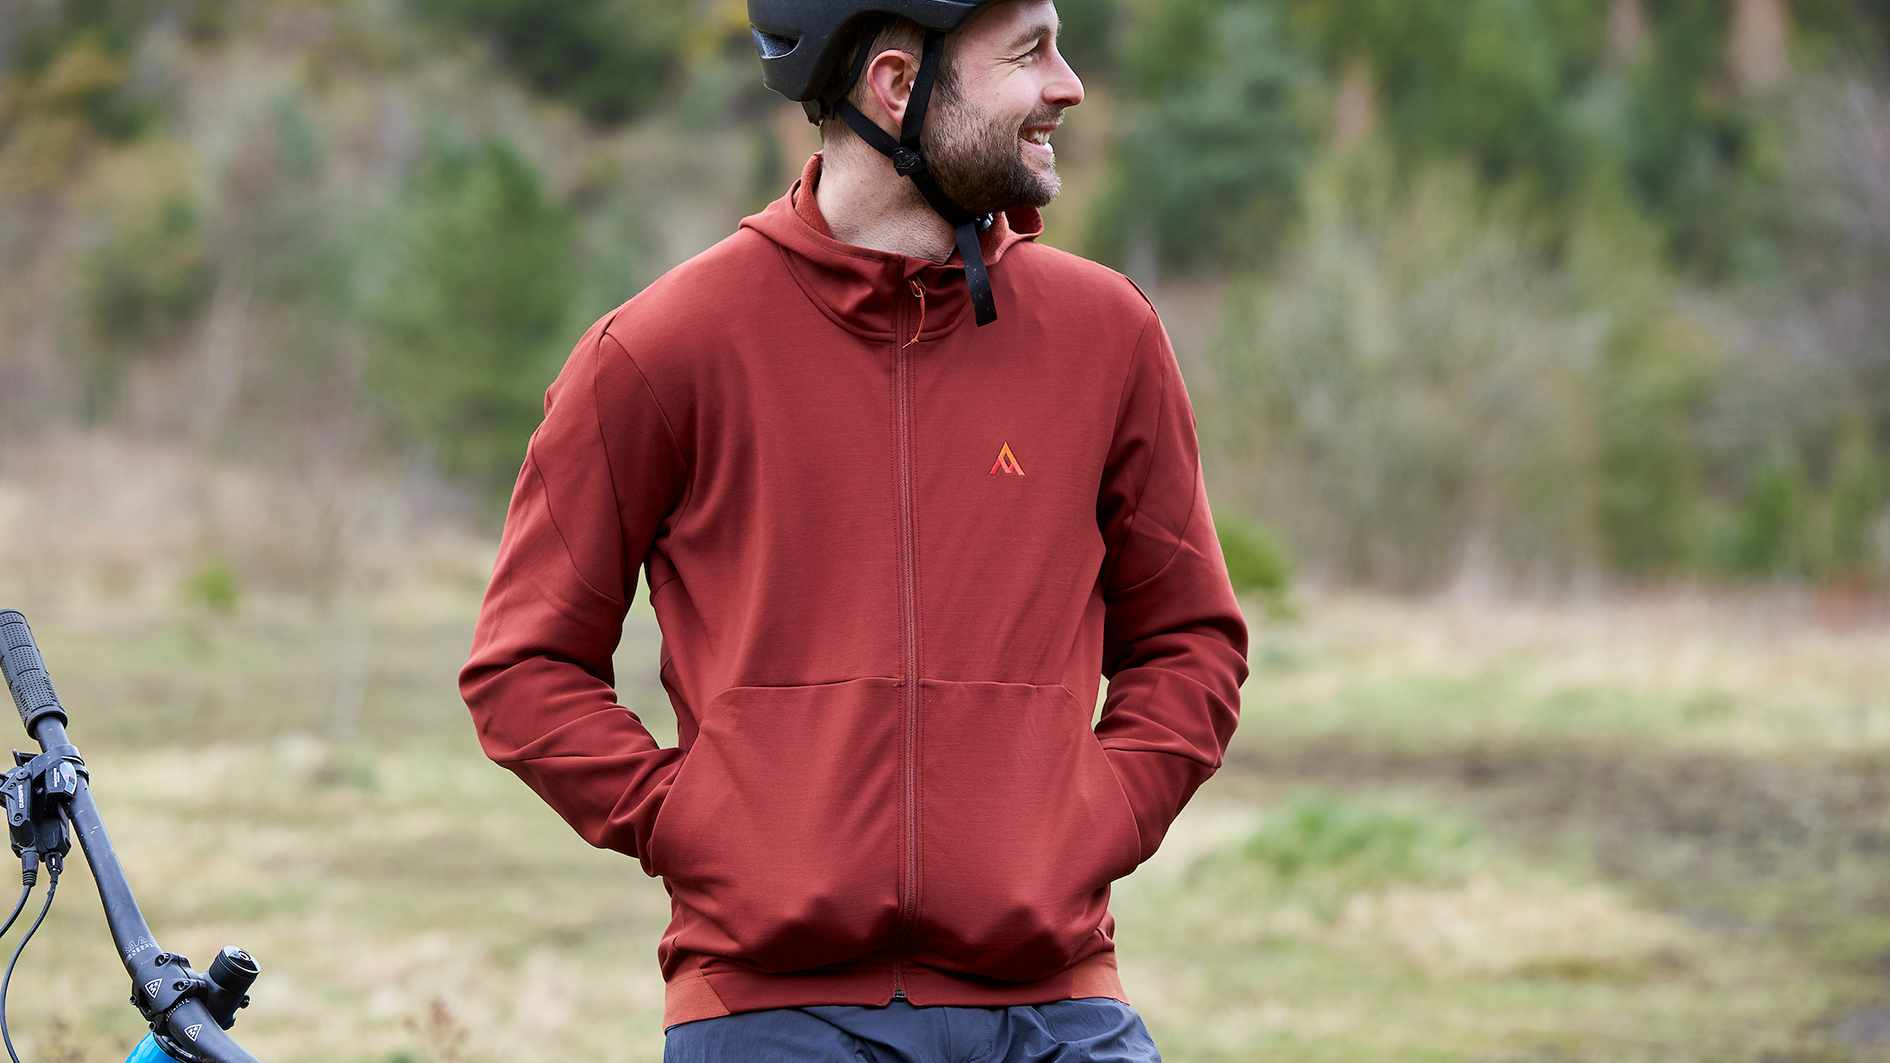 Alex Evans wearing 7Mesh riding clothing. Tirpentwys Pontypool, Wales. February 2019.